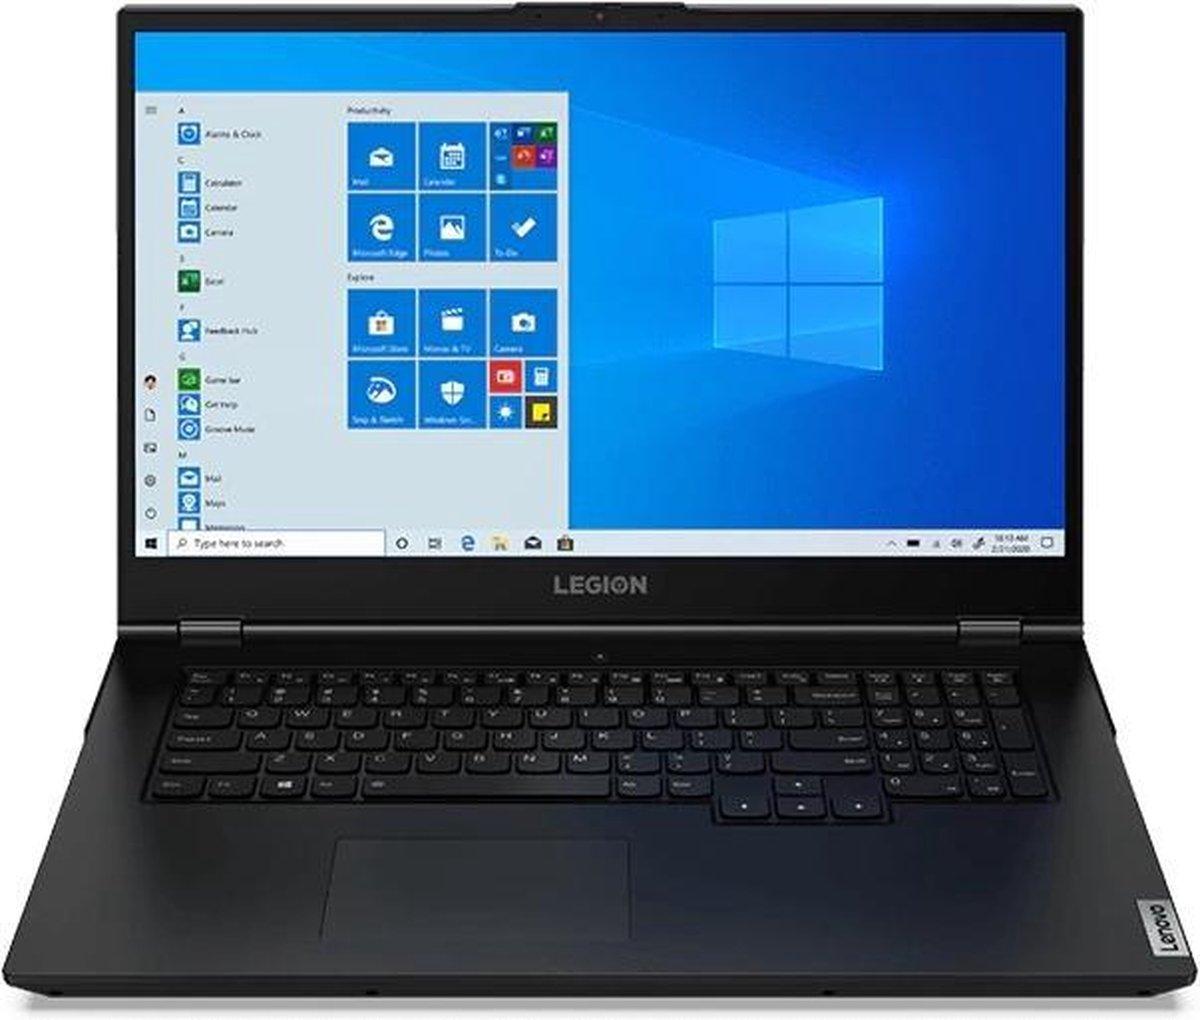 "Lenovo Legion 5 Notebook 43,9 cm (17.3"") 1920 x 1080 Pixels Intel® 10de generatie Core™ i7 16 GB DDR4-SDRAM 512 GB SSD NVIDIA® GeForce® GTX 1650 Wi-Fi 6 (802.11ax) Windows 10 Home Zwart"